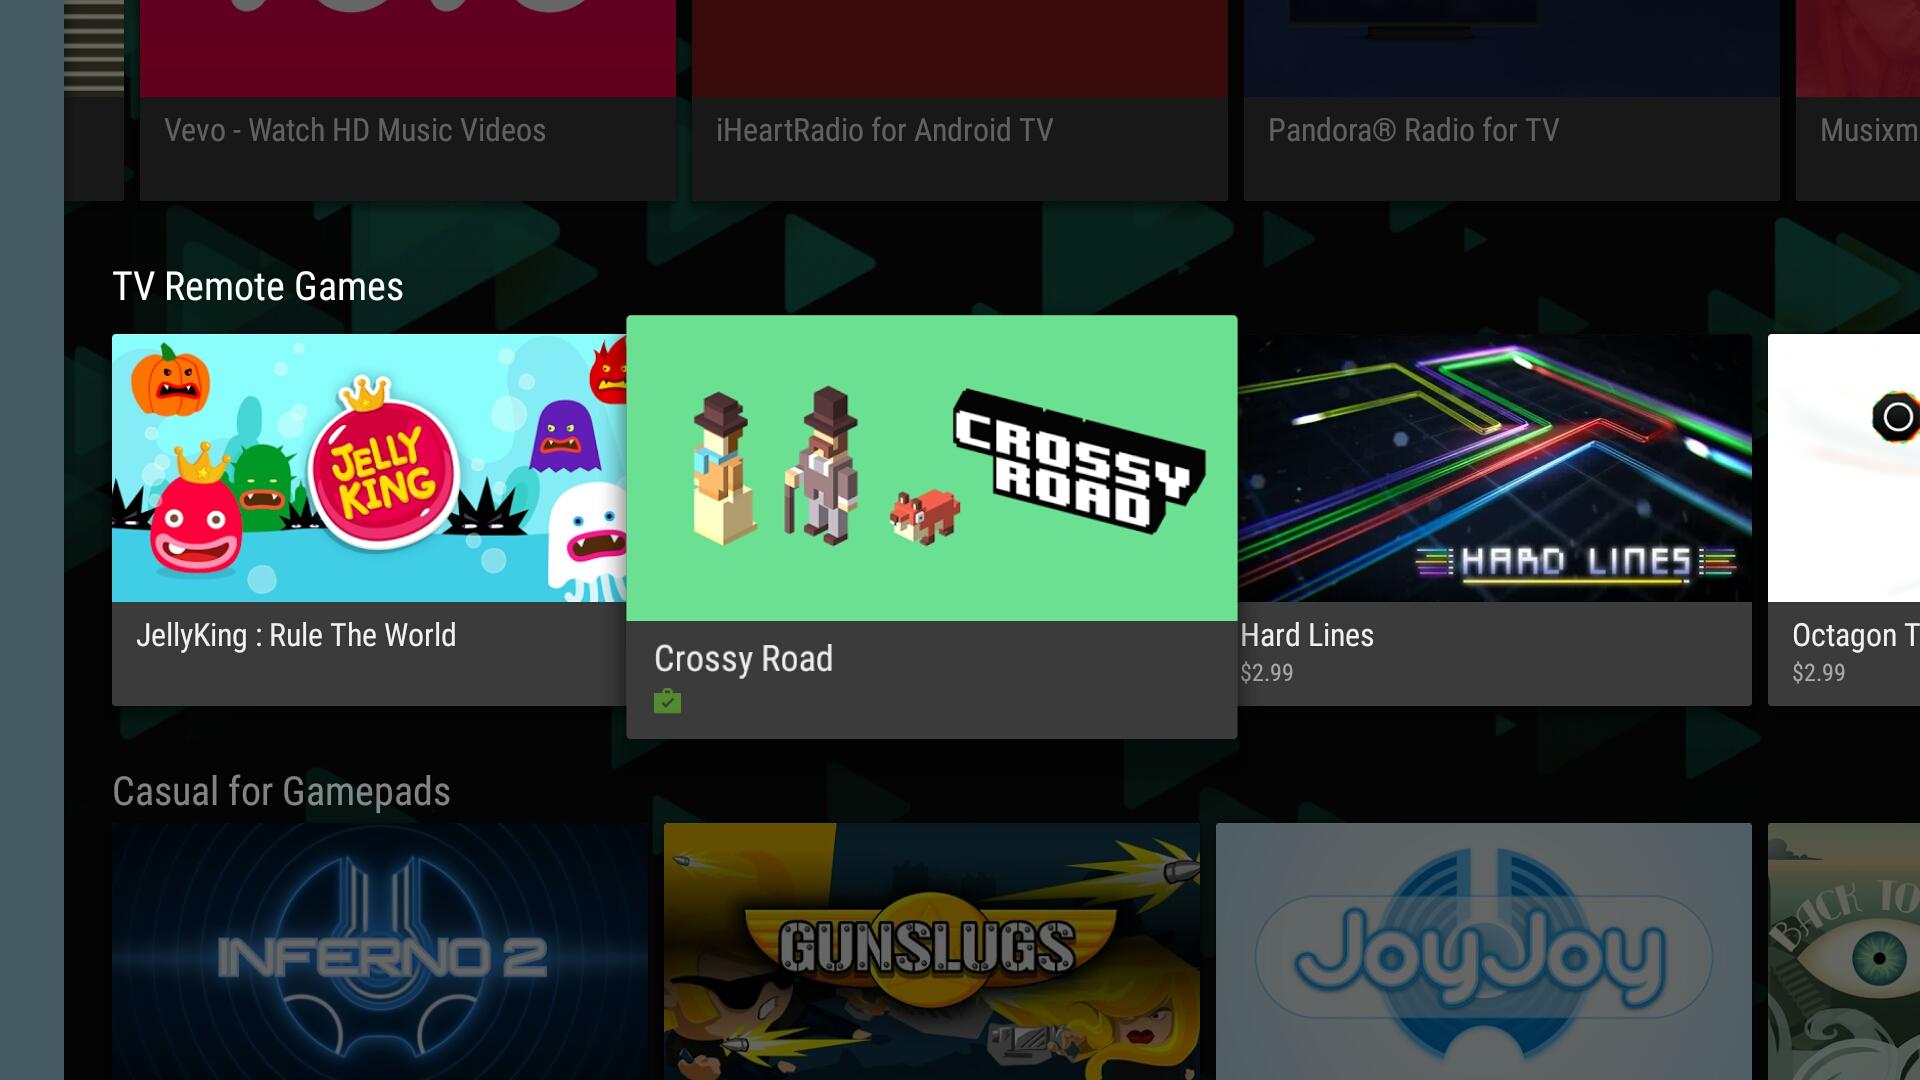 google-play-store-20150526-202440.jpg